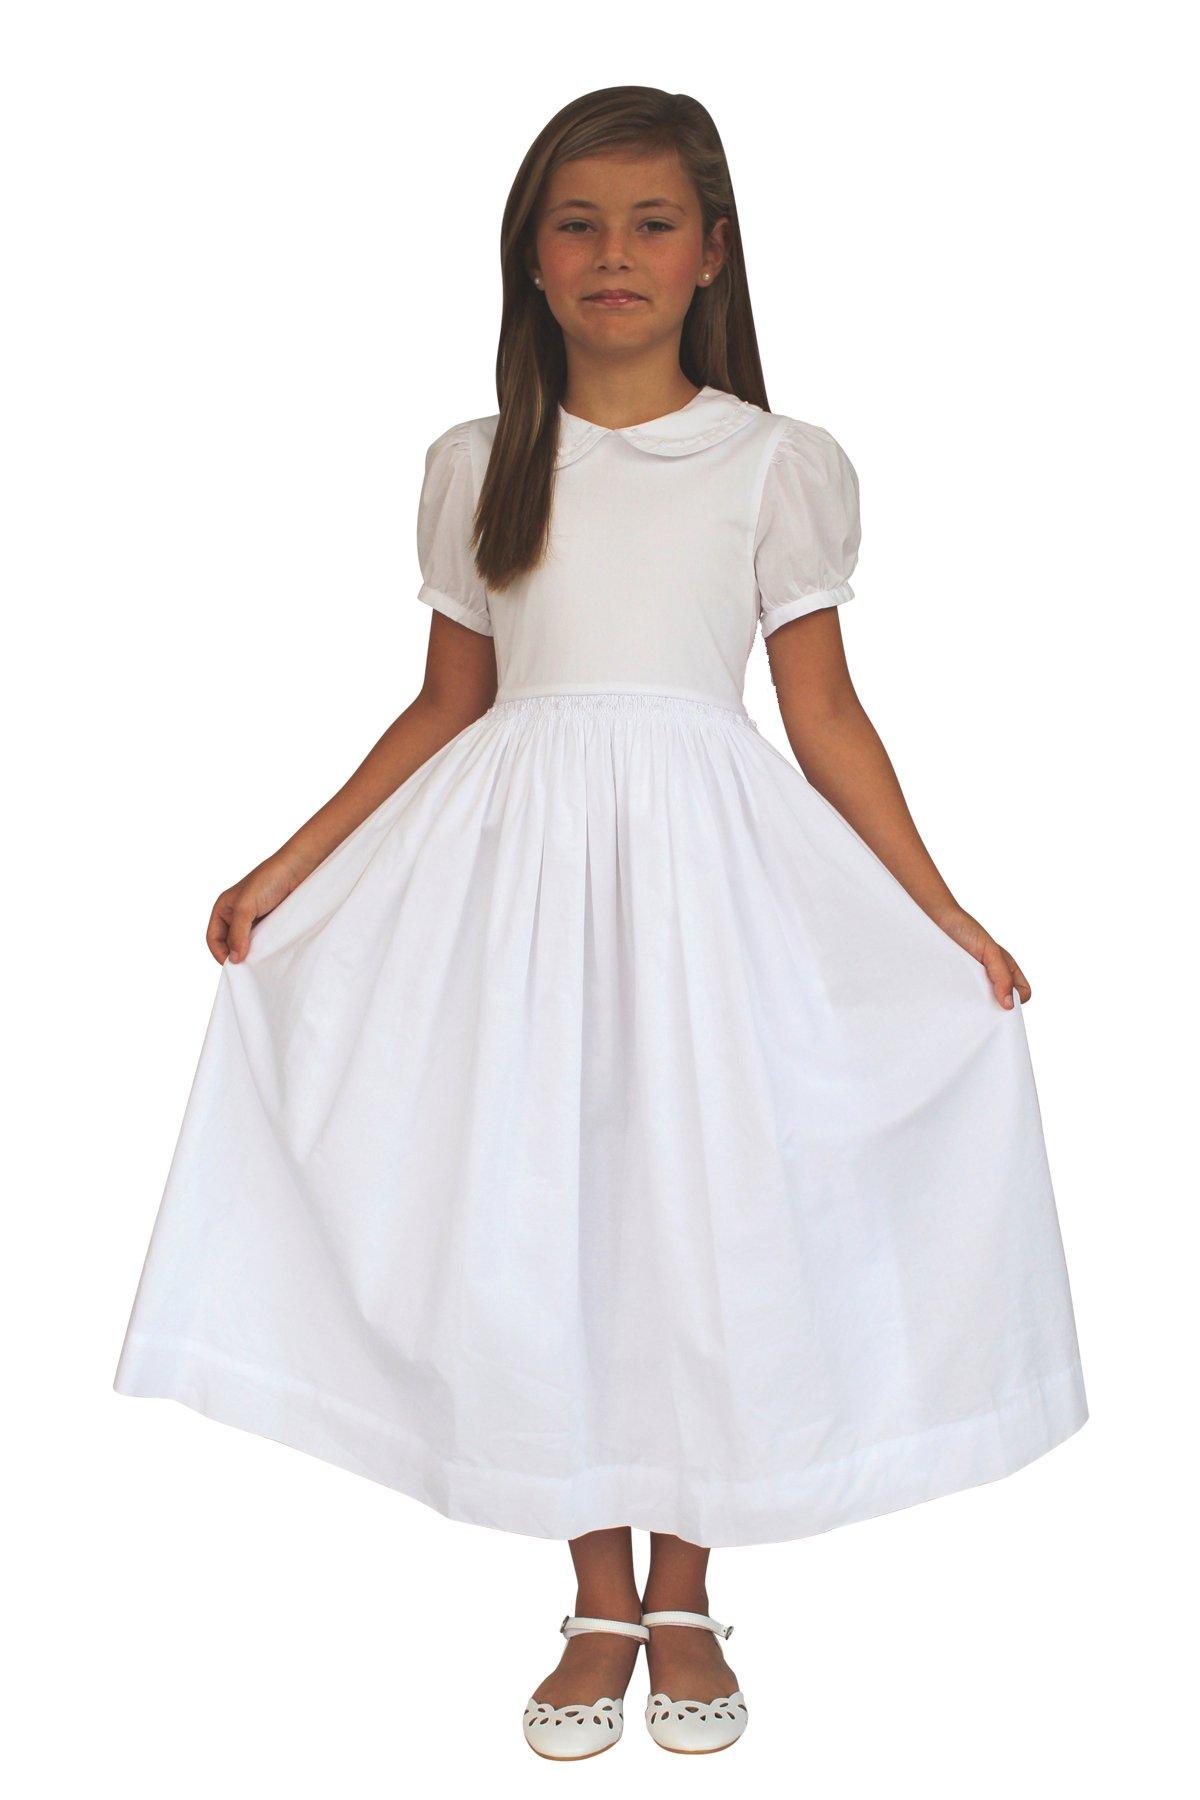 Strasburg Children Mary Classic Girls First Communion Dress Simple White Baptism Dress(10)